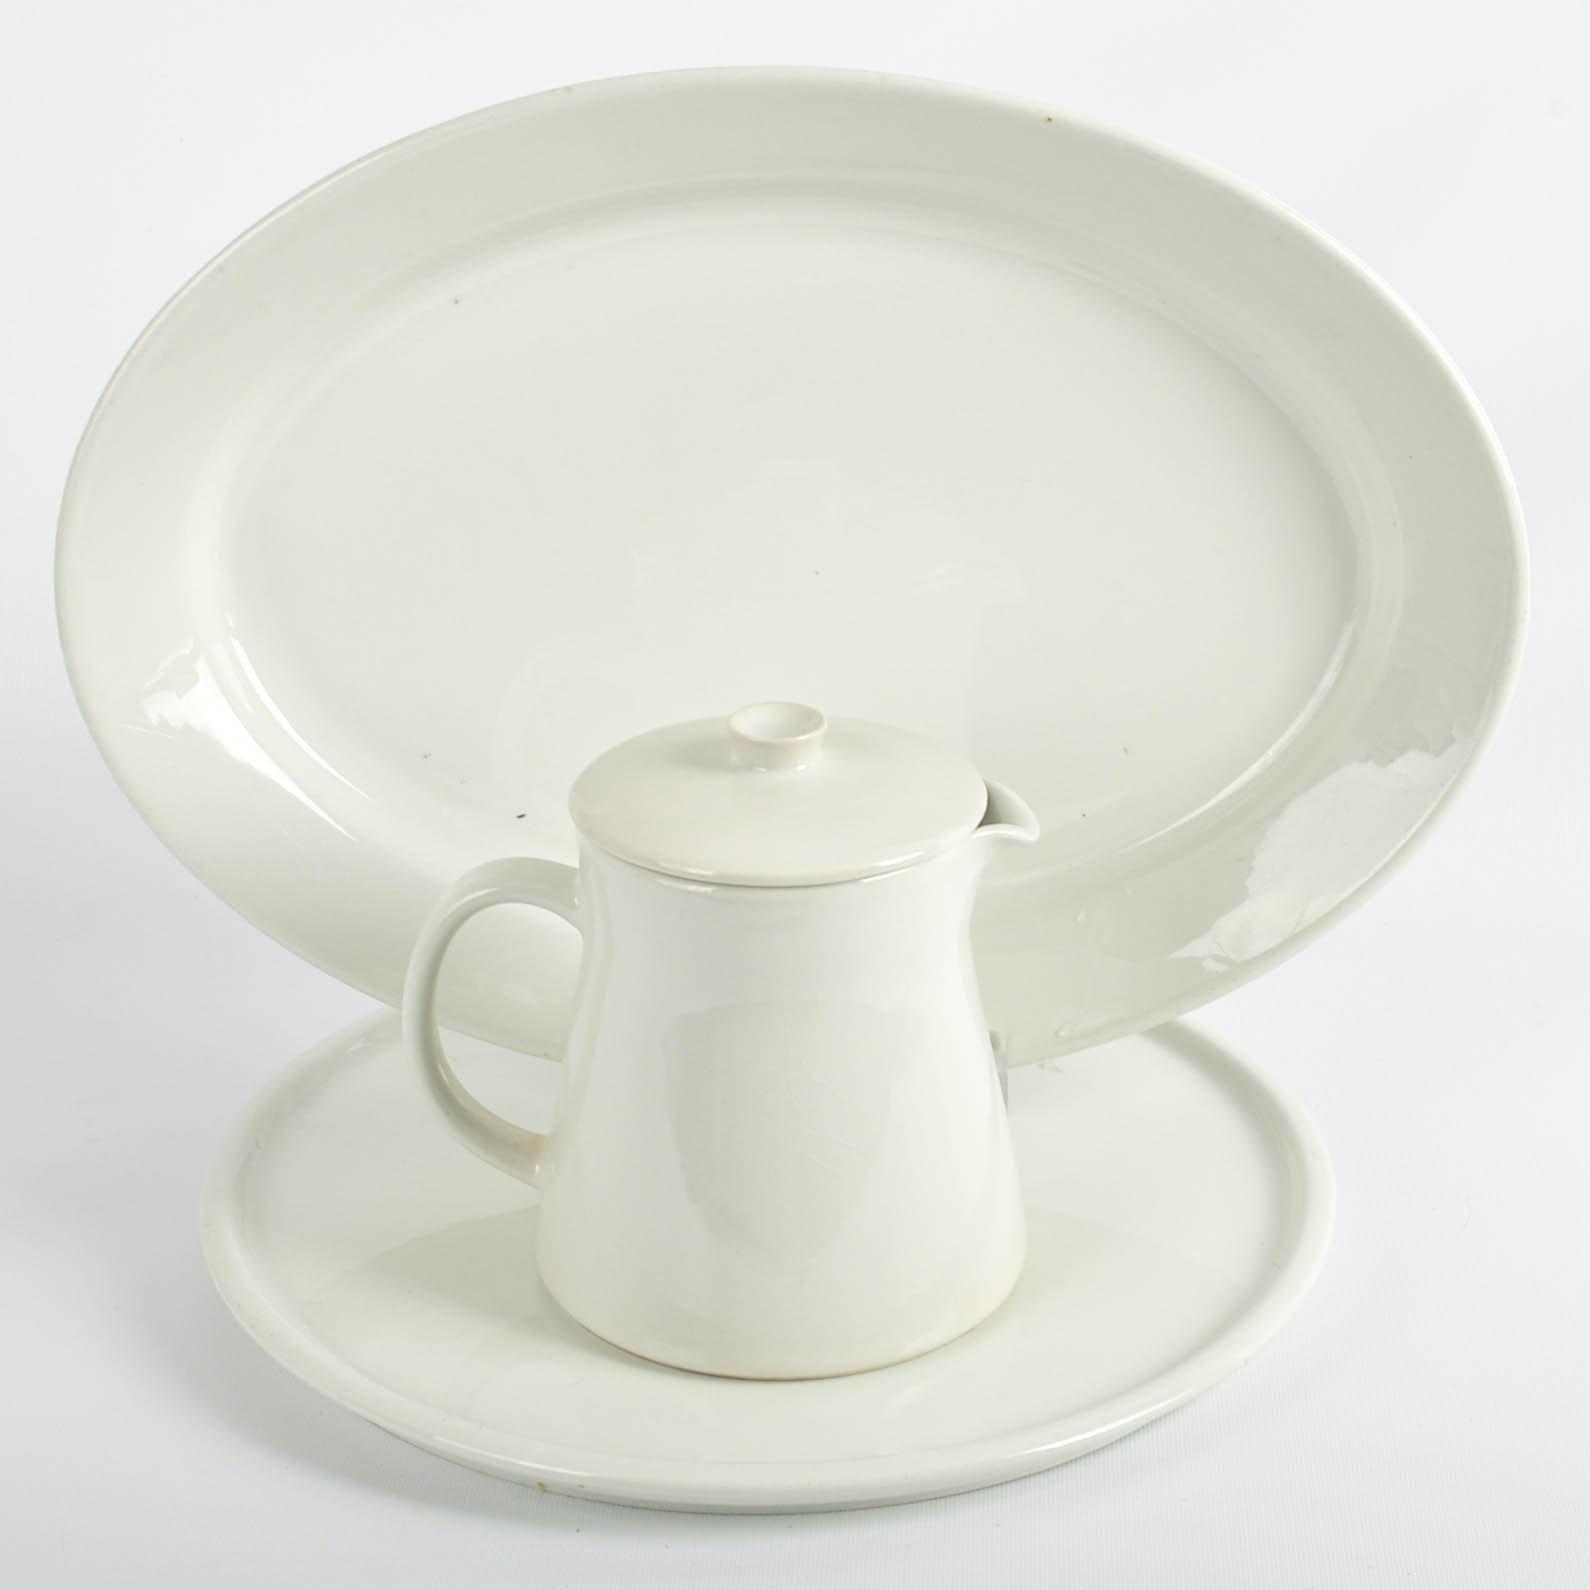 Vintage Arabia of Finland White China Tableware